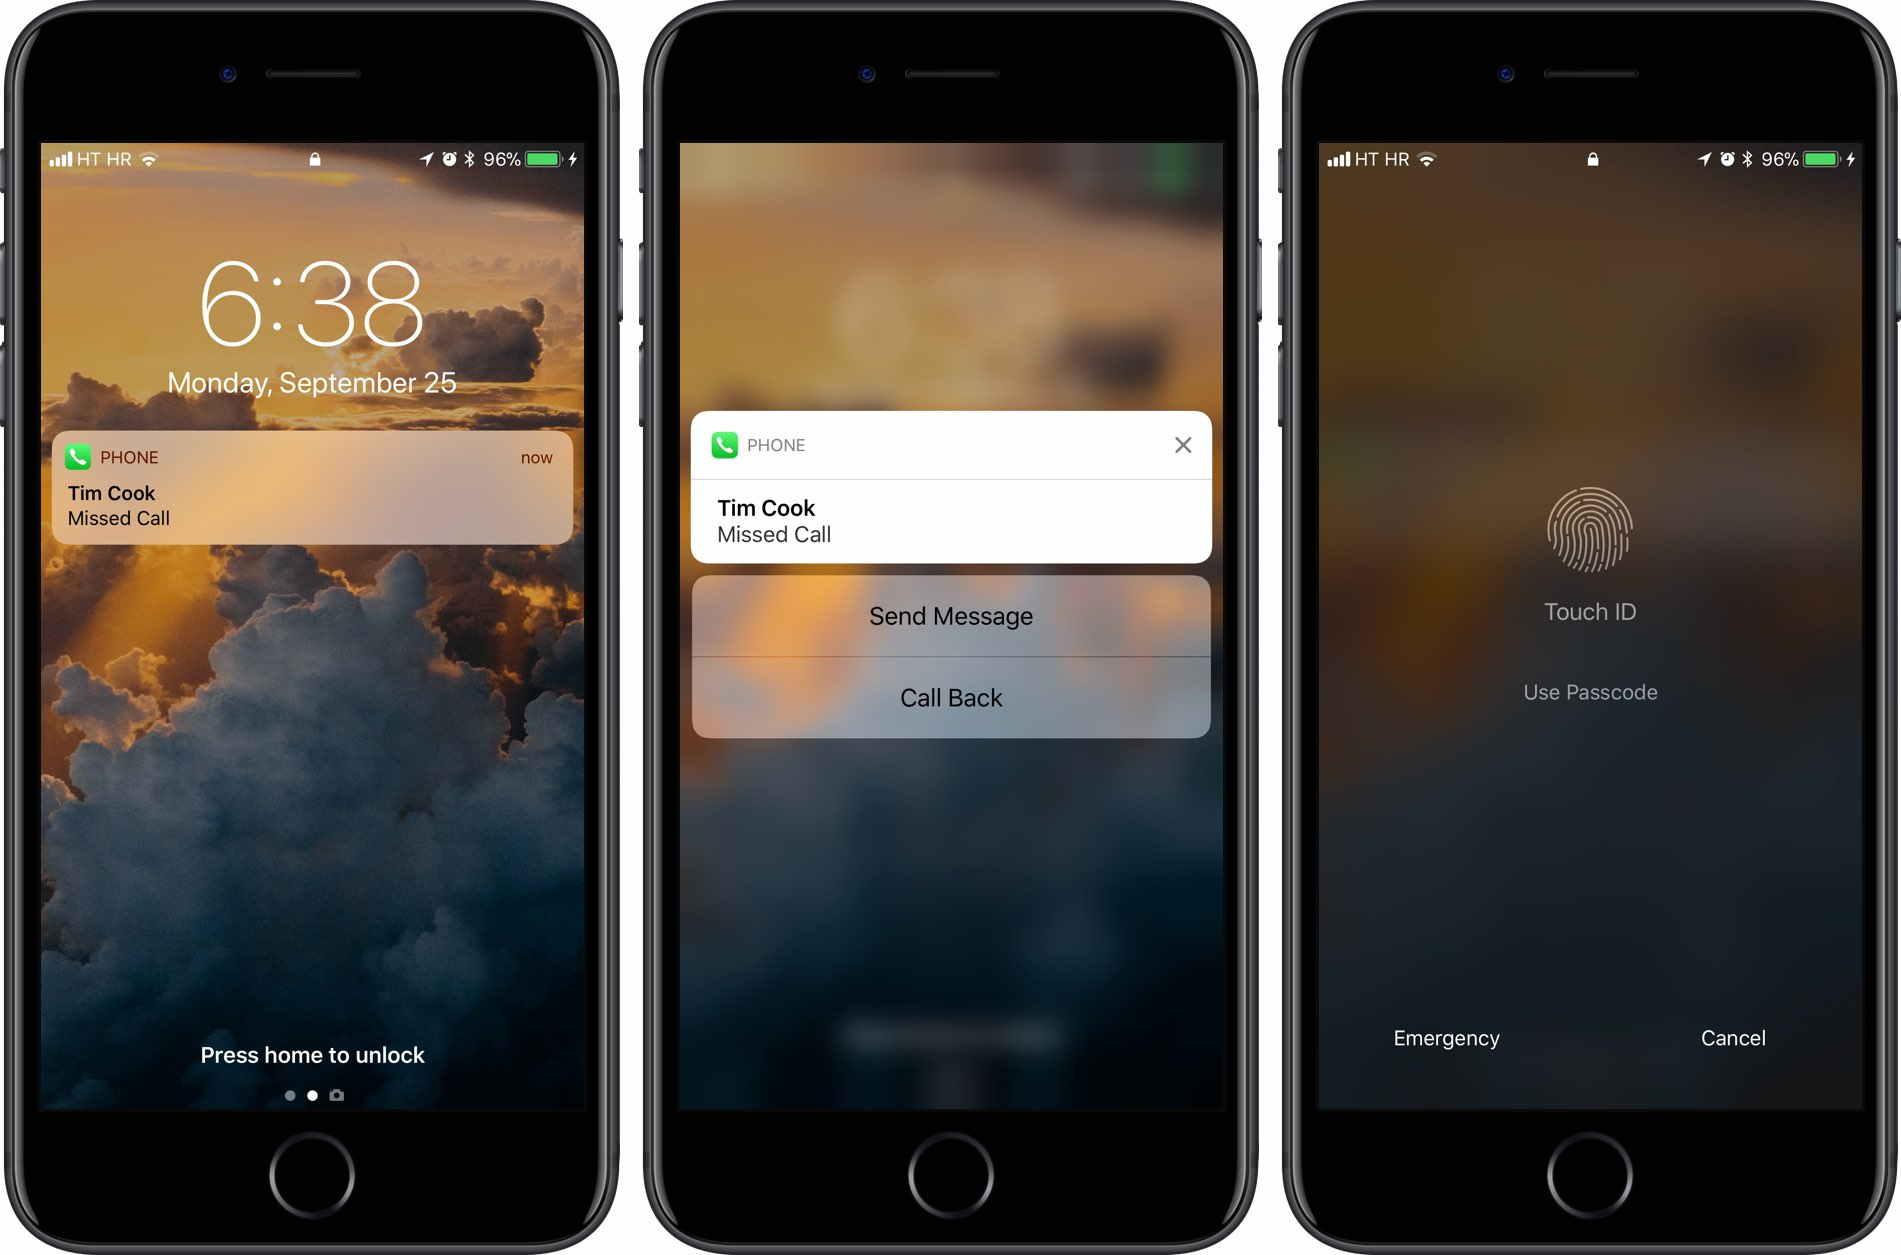 Nguoi dung iPhone Lock tai Viet Nam lai khon don sau ban cap nhat iOS 12.3 (6).